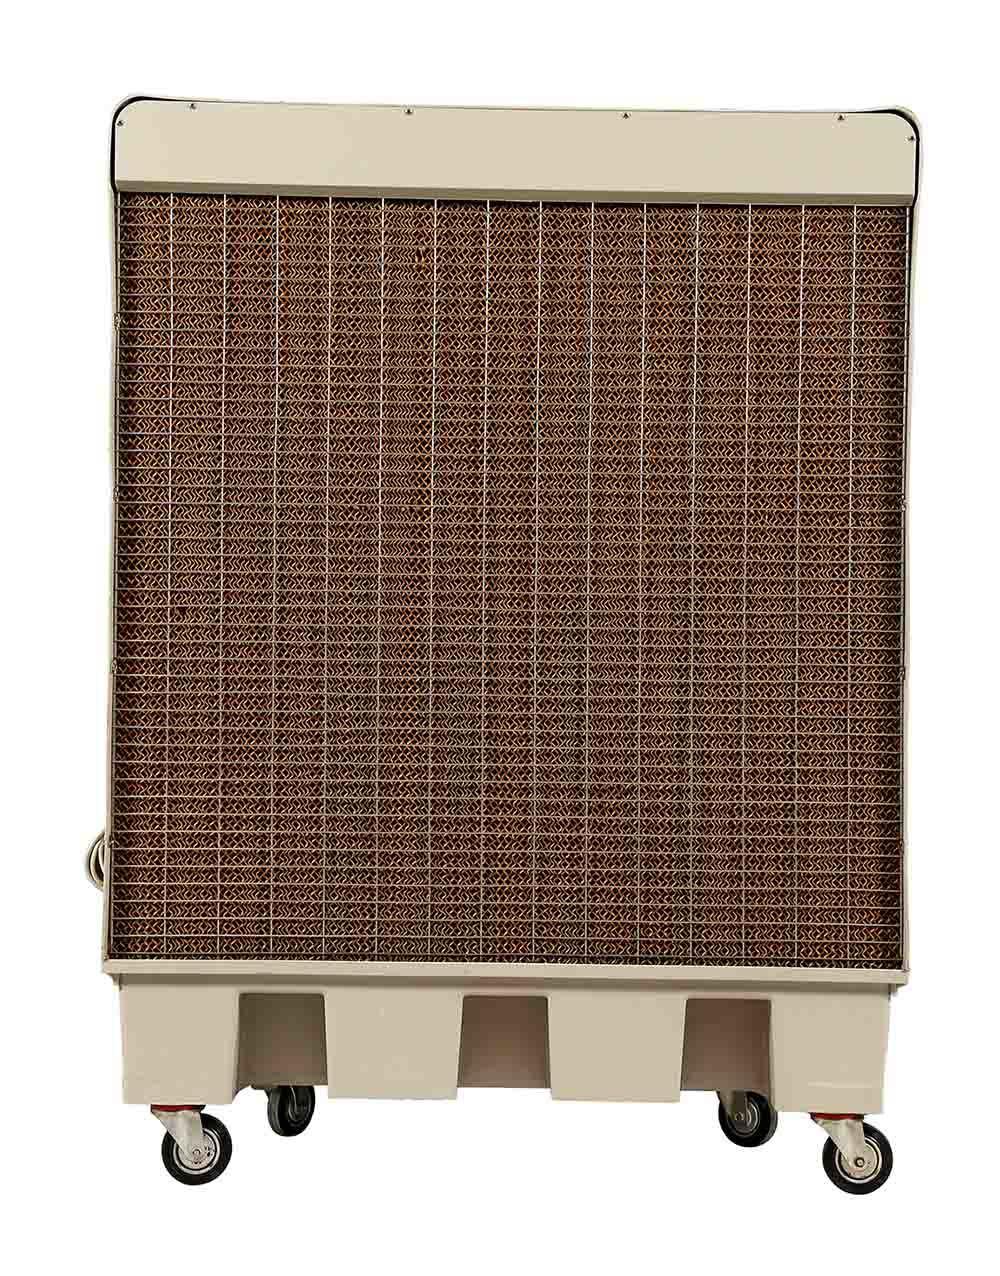 Air Cooler/ Evaporative Air Cooler/ Portable Air Cooler/ Spot Air Cooler